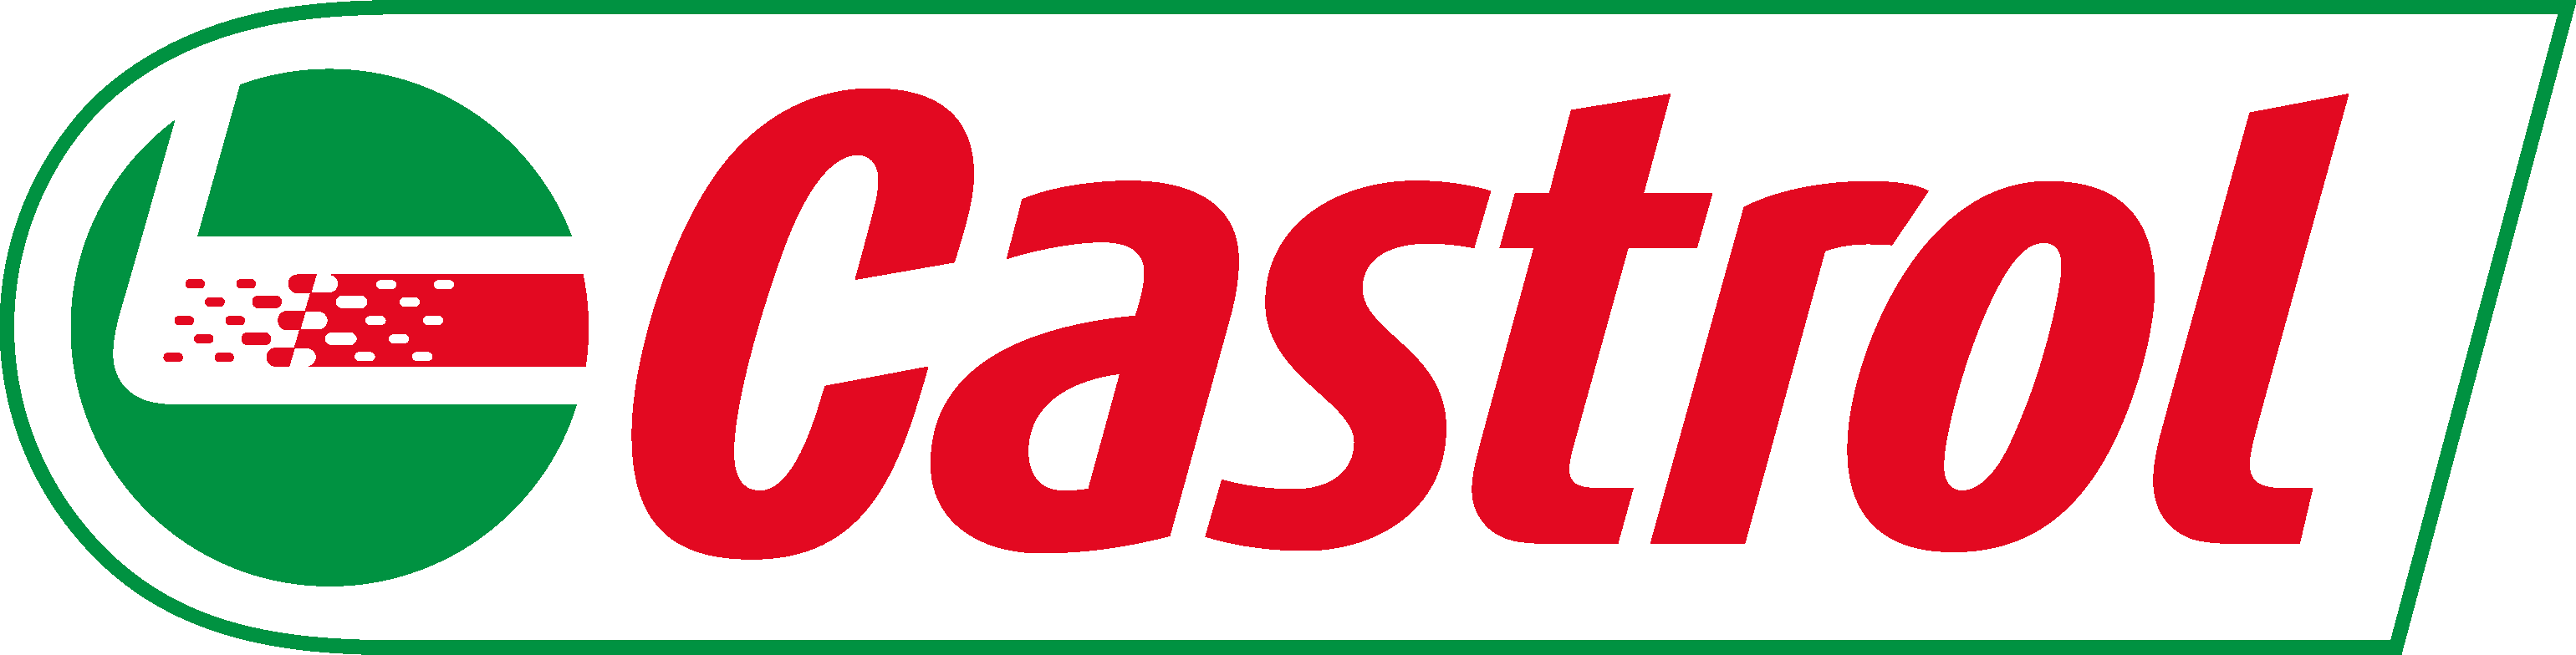 Castrol Logo png